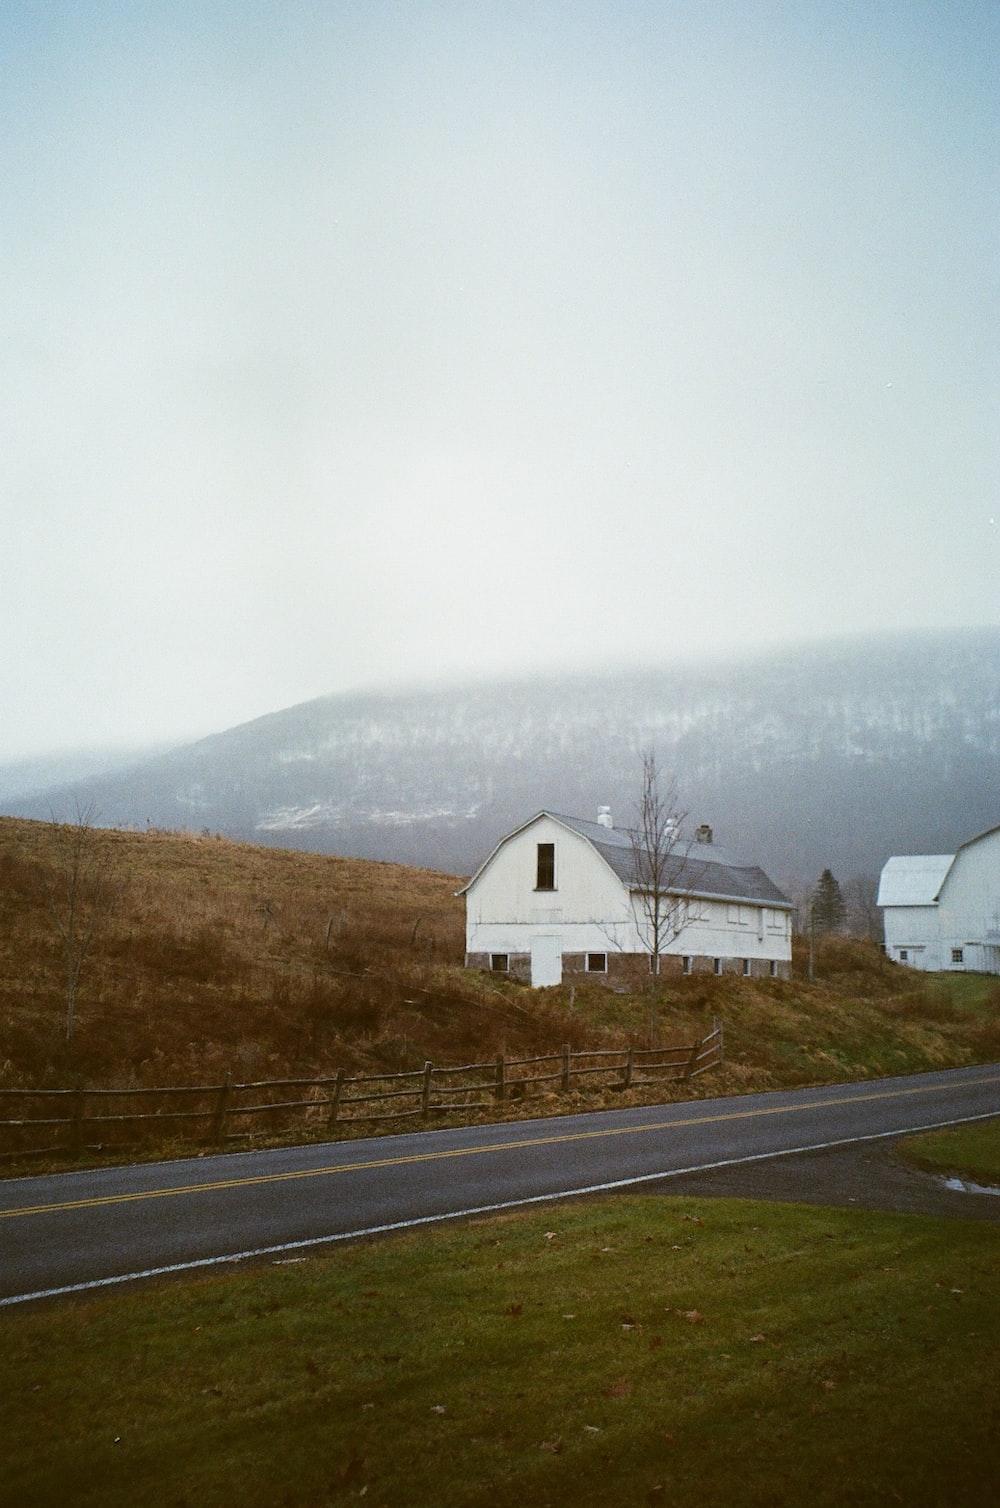 storage house near road